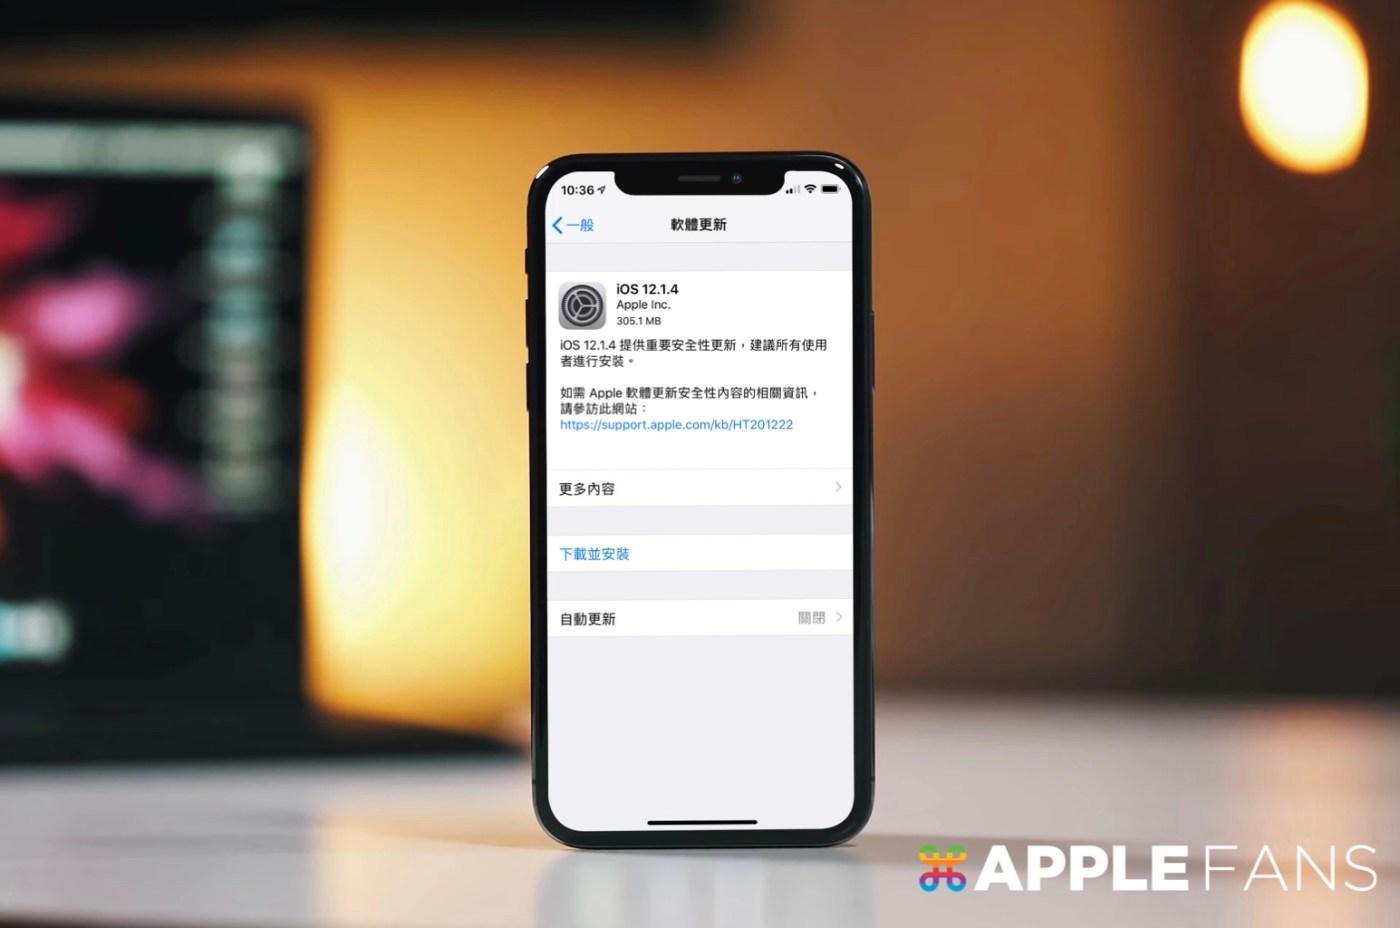 iOS 12.1.4 更新